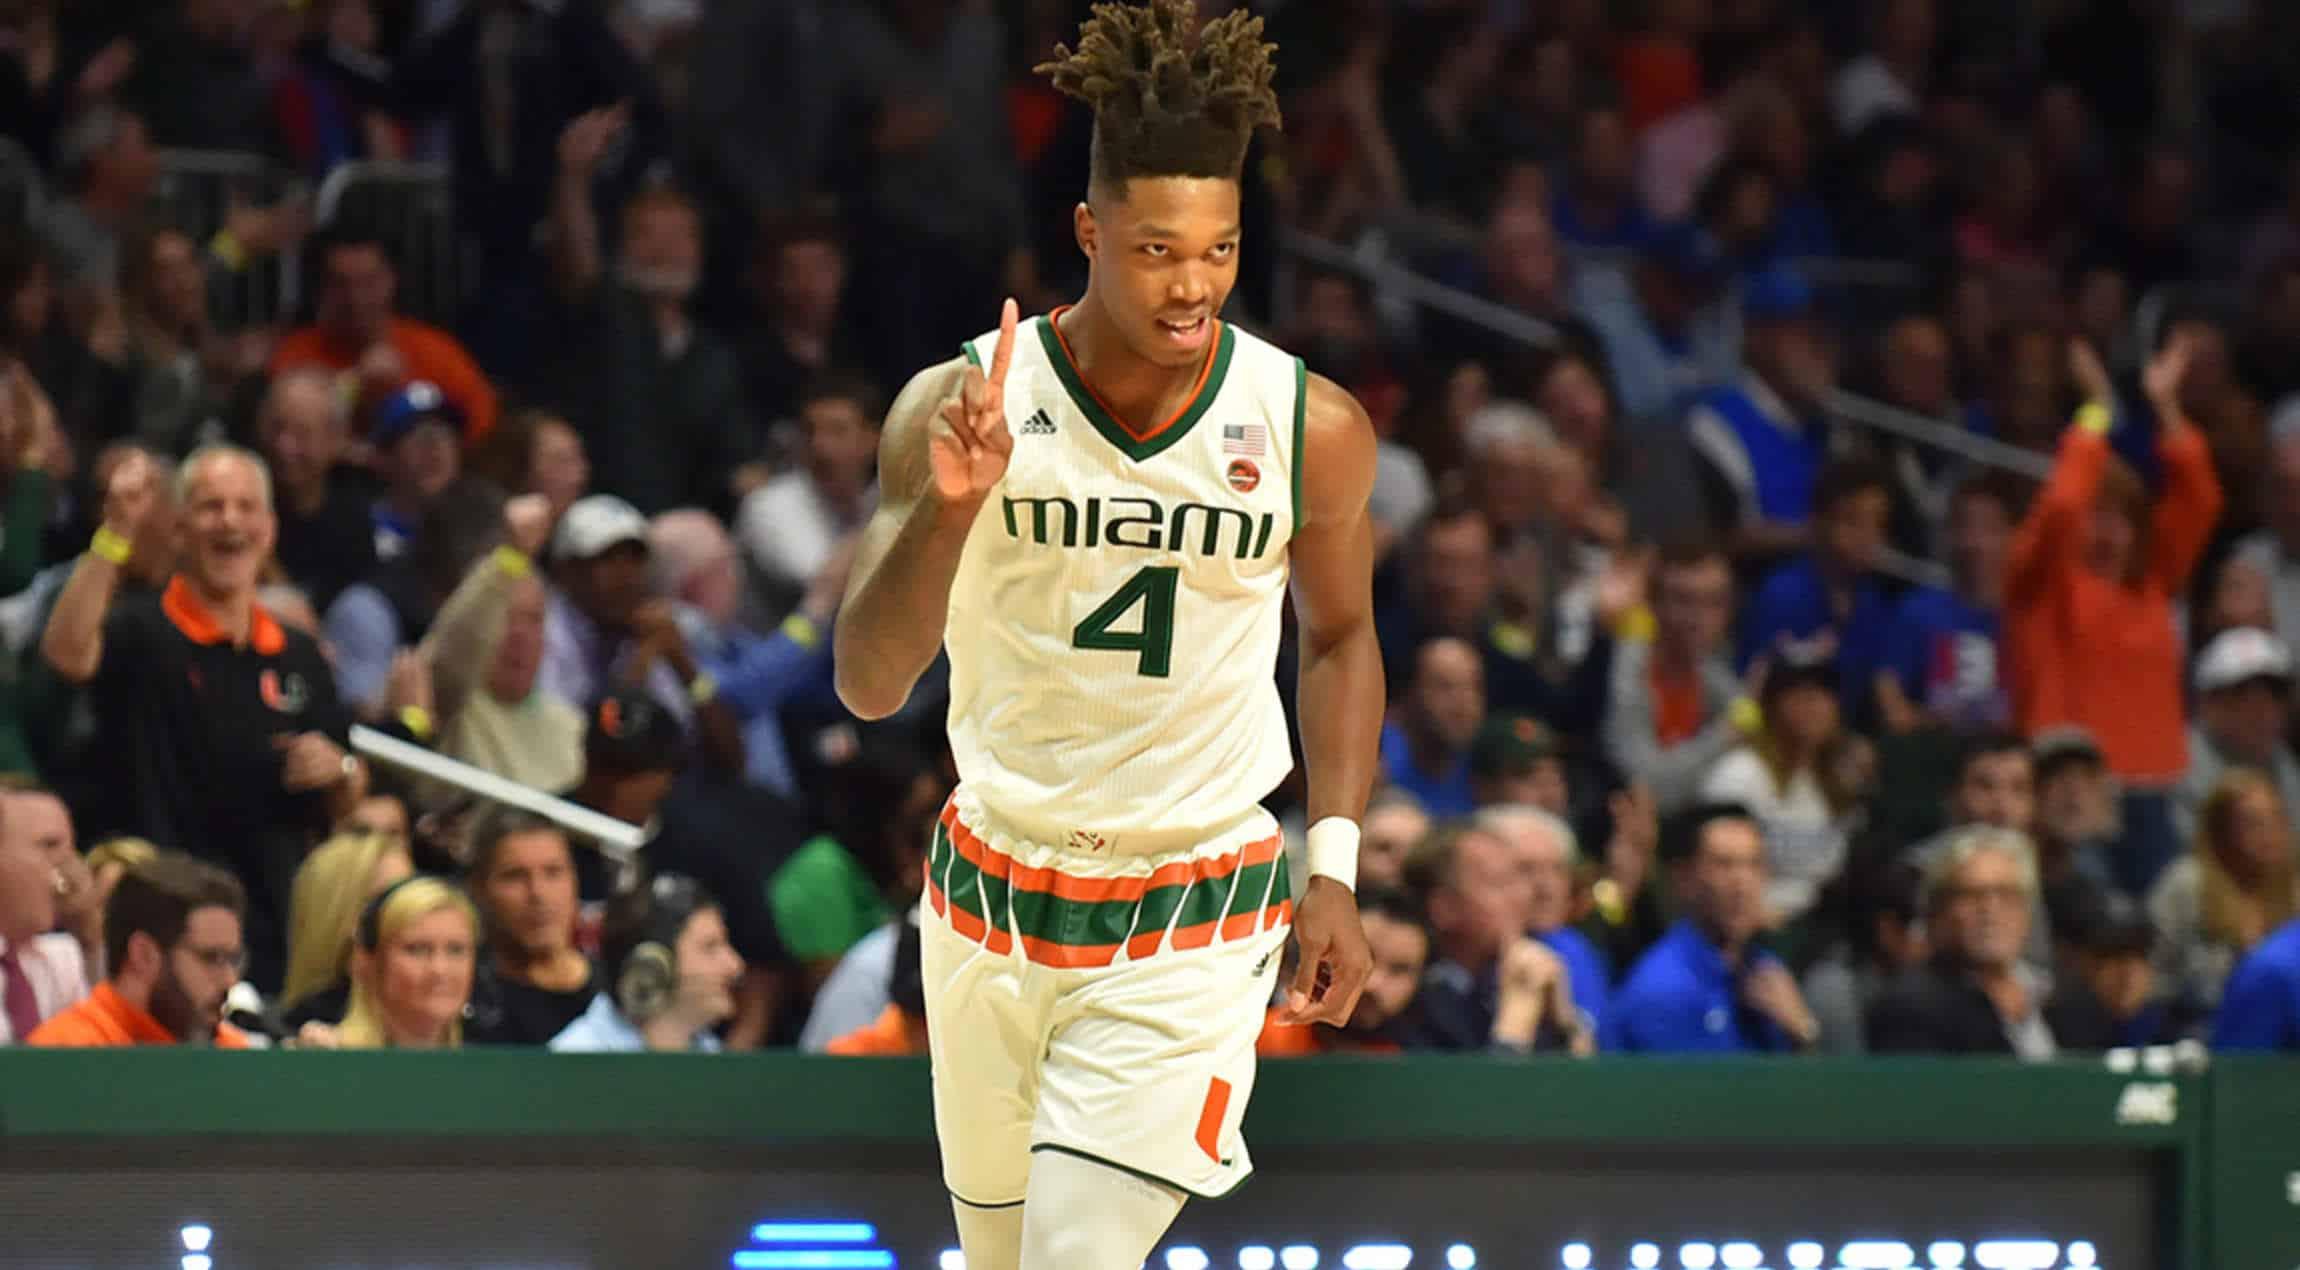 BasketballNcaa - Miami - Lonnie Walker